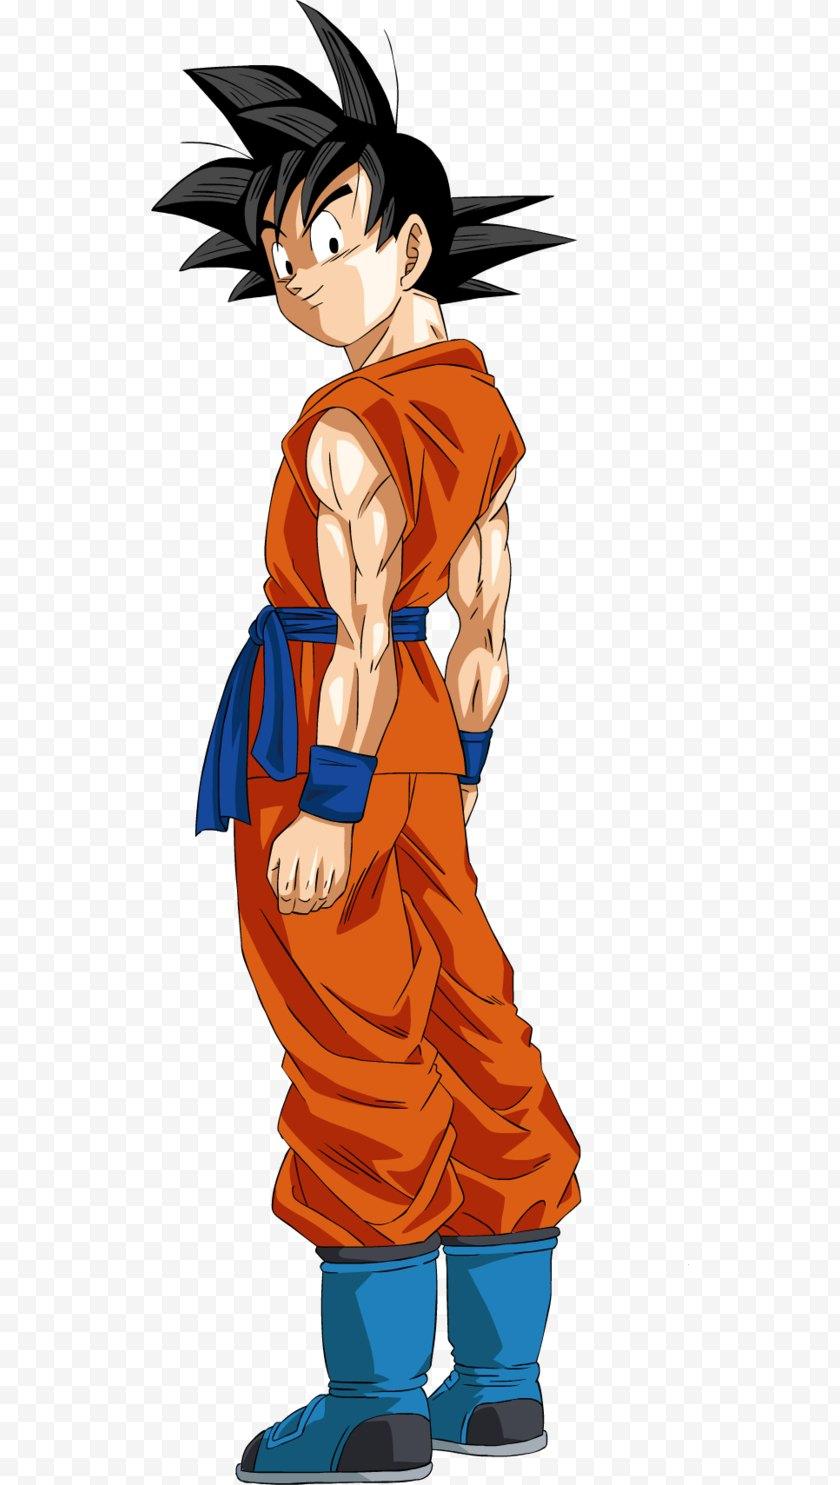 Flower - Goku Vegeta Gohan Piccolo Super Saiya - Watercolor Free PNG